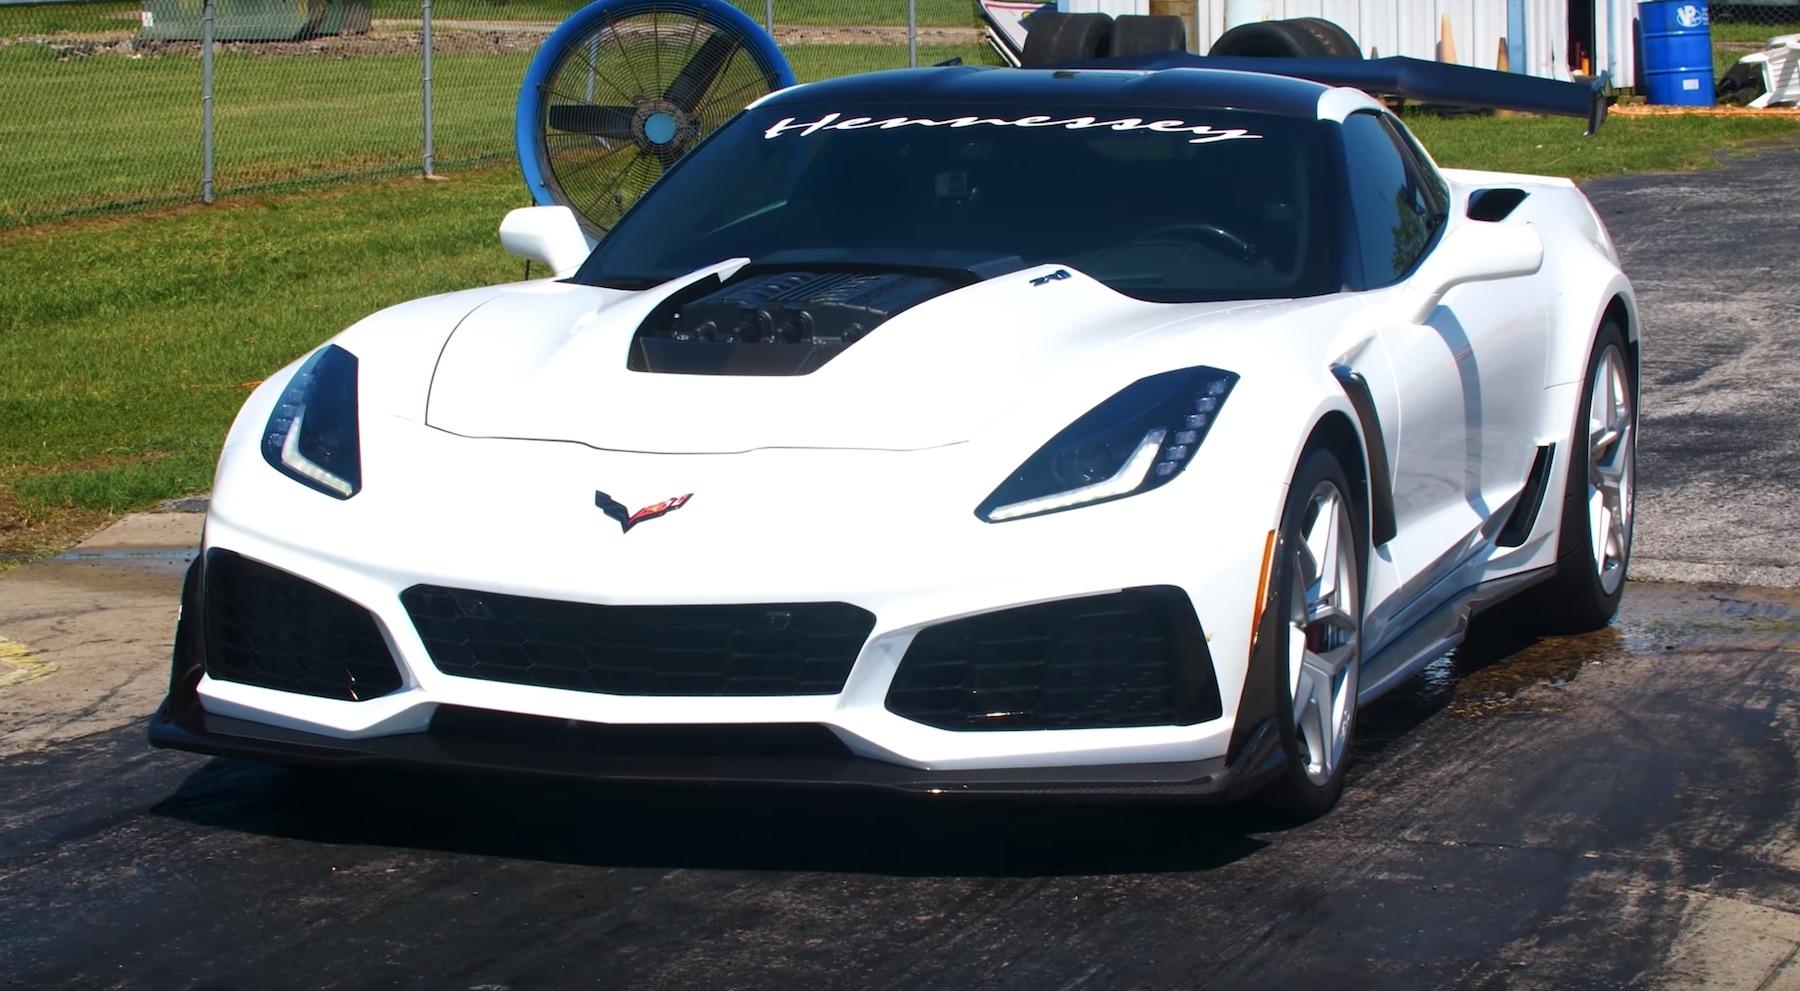 HPE 1000 Corvette ZR1